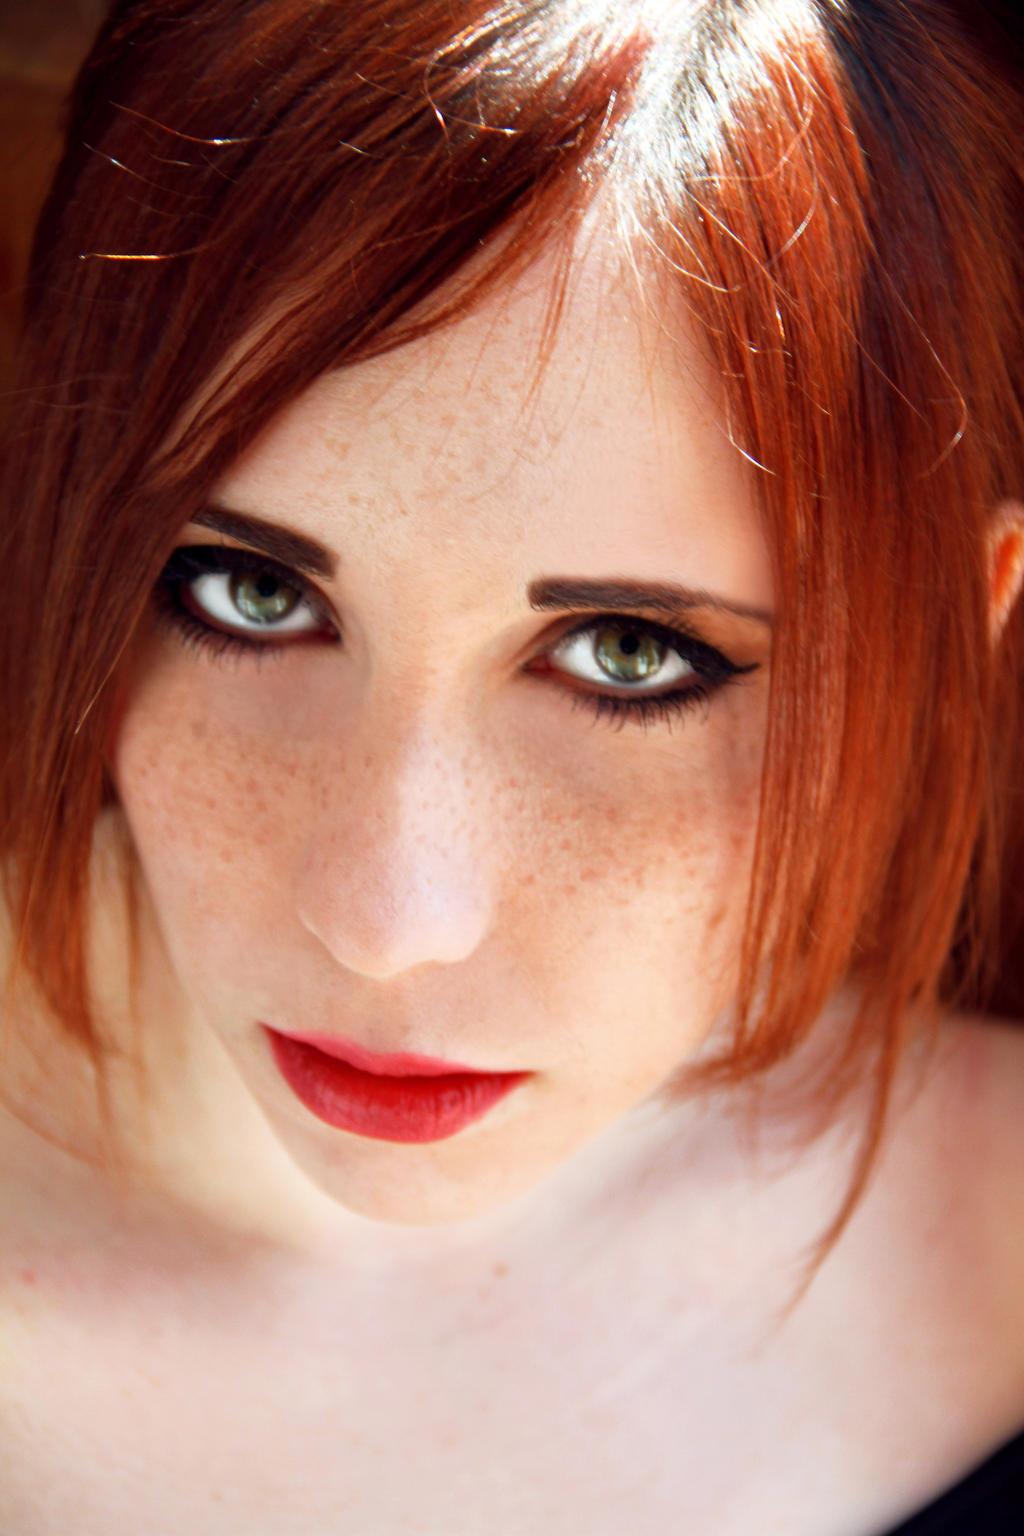 Gingy Look by Stephanie-van-Rijn